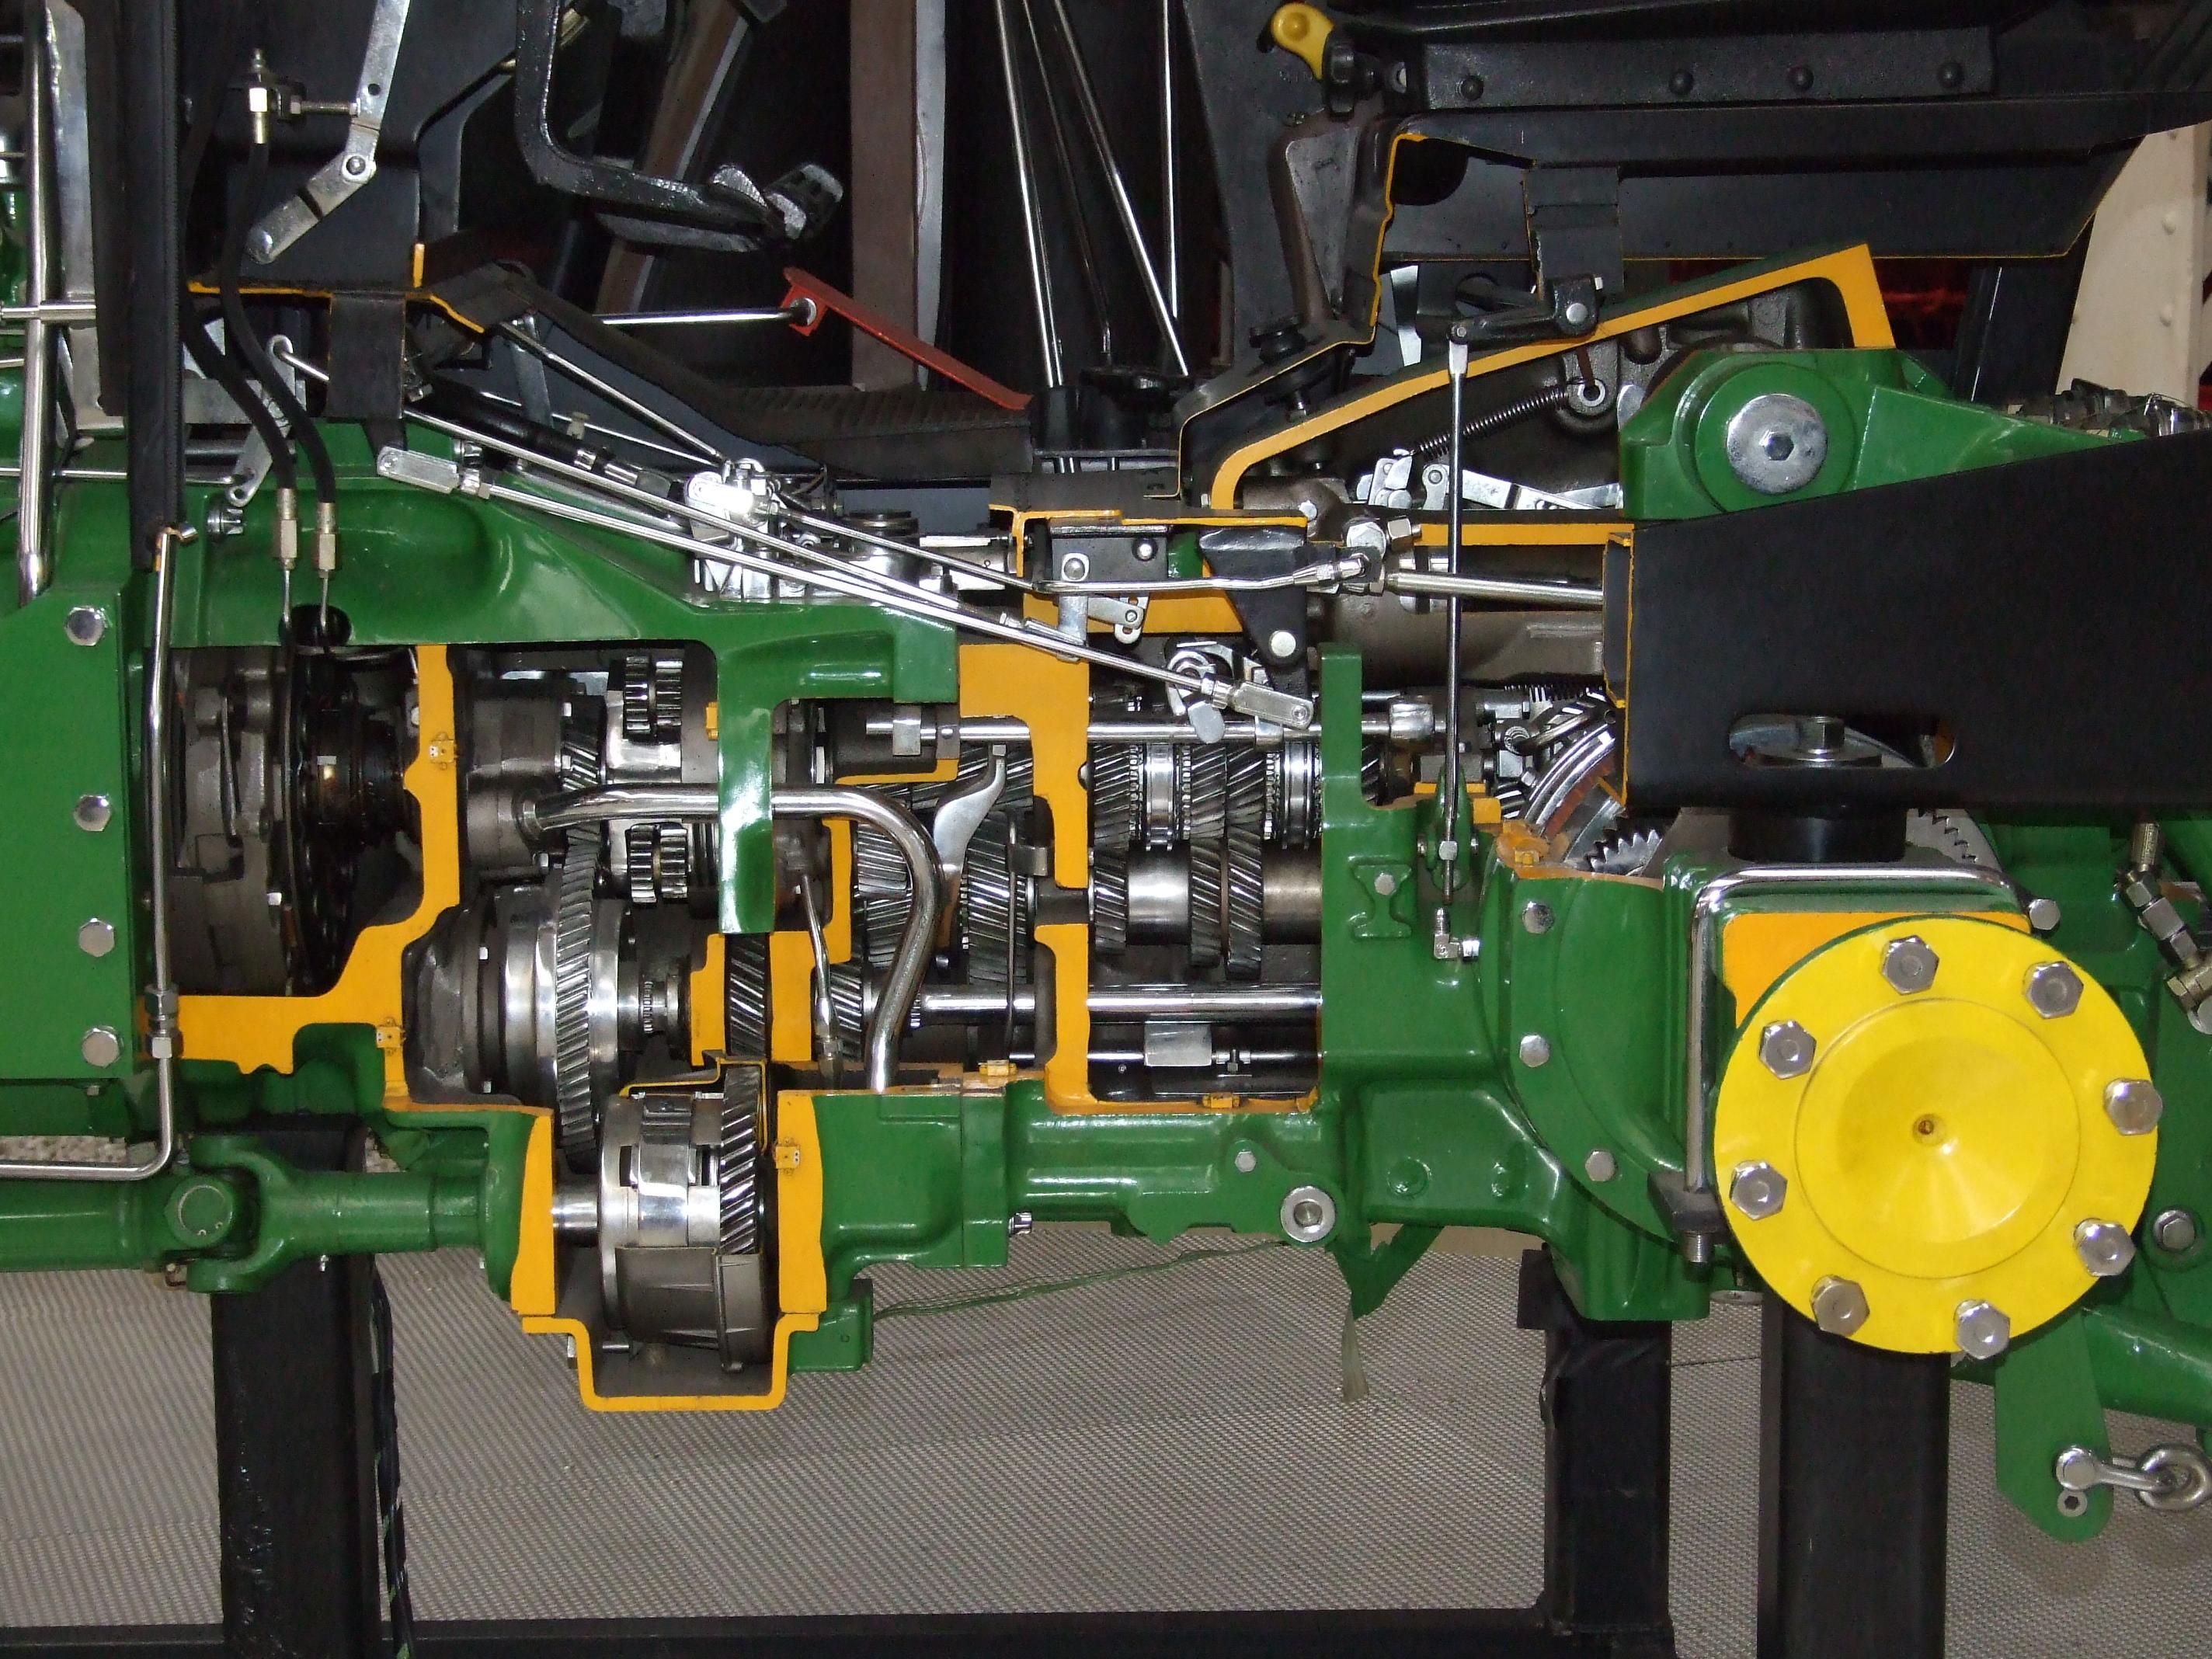 File:John Deere 3350 tractor cut transmission.JPG - Wikipedia